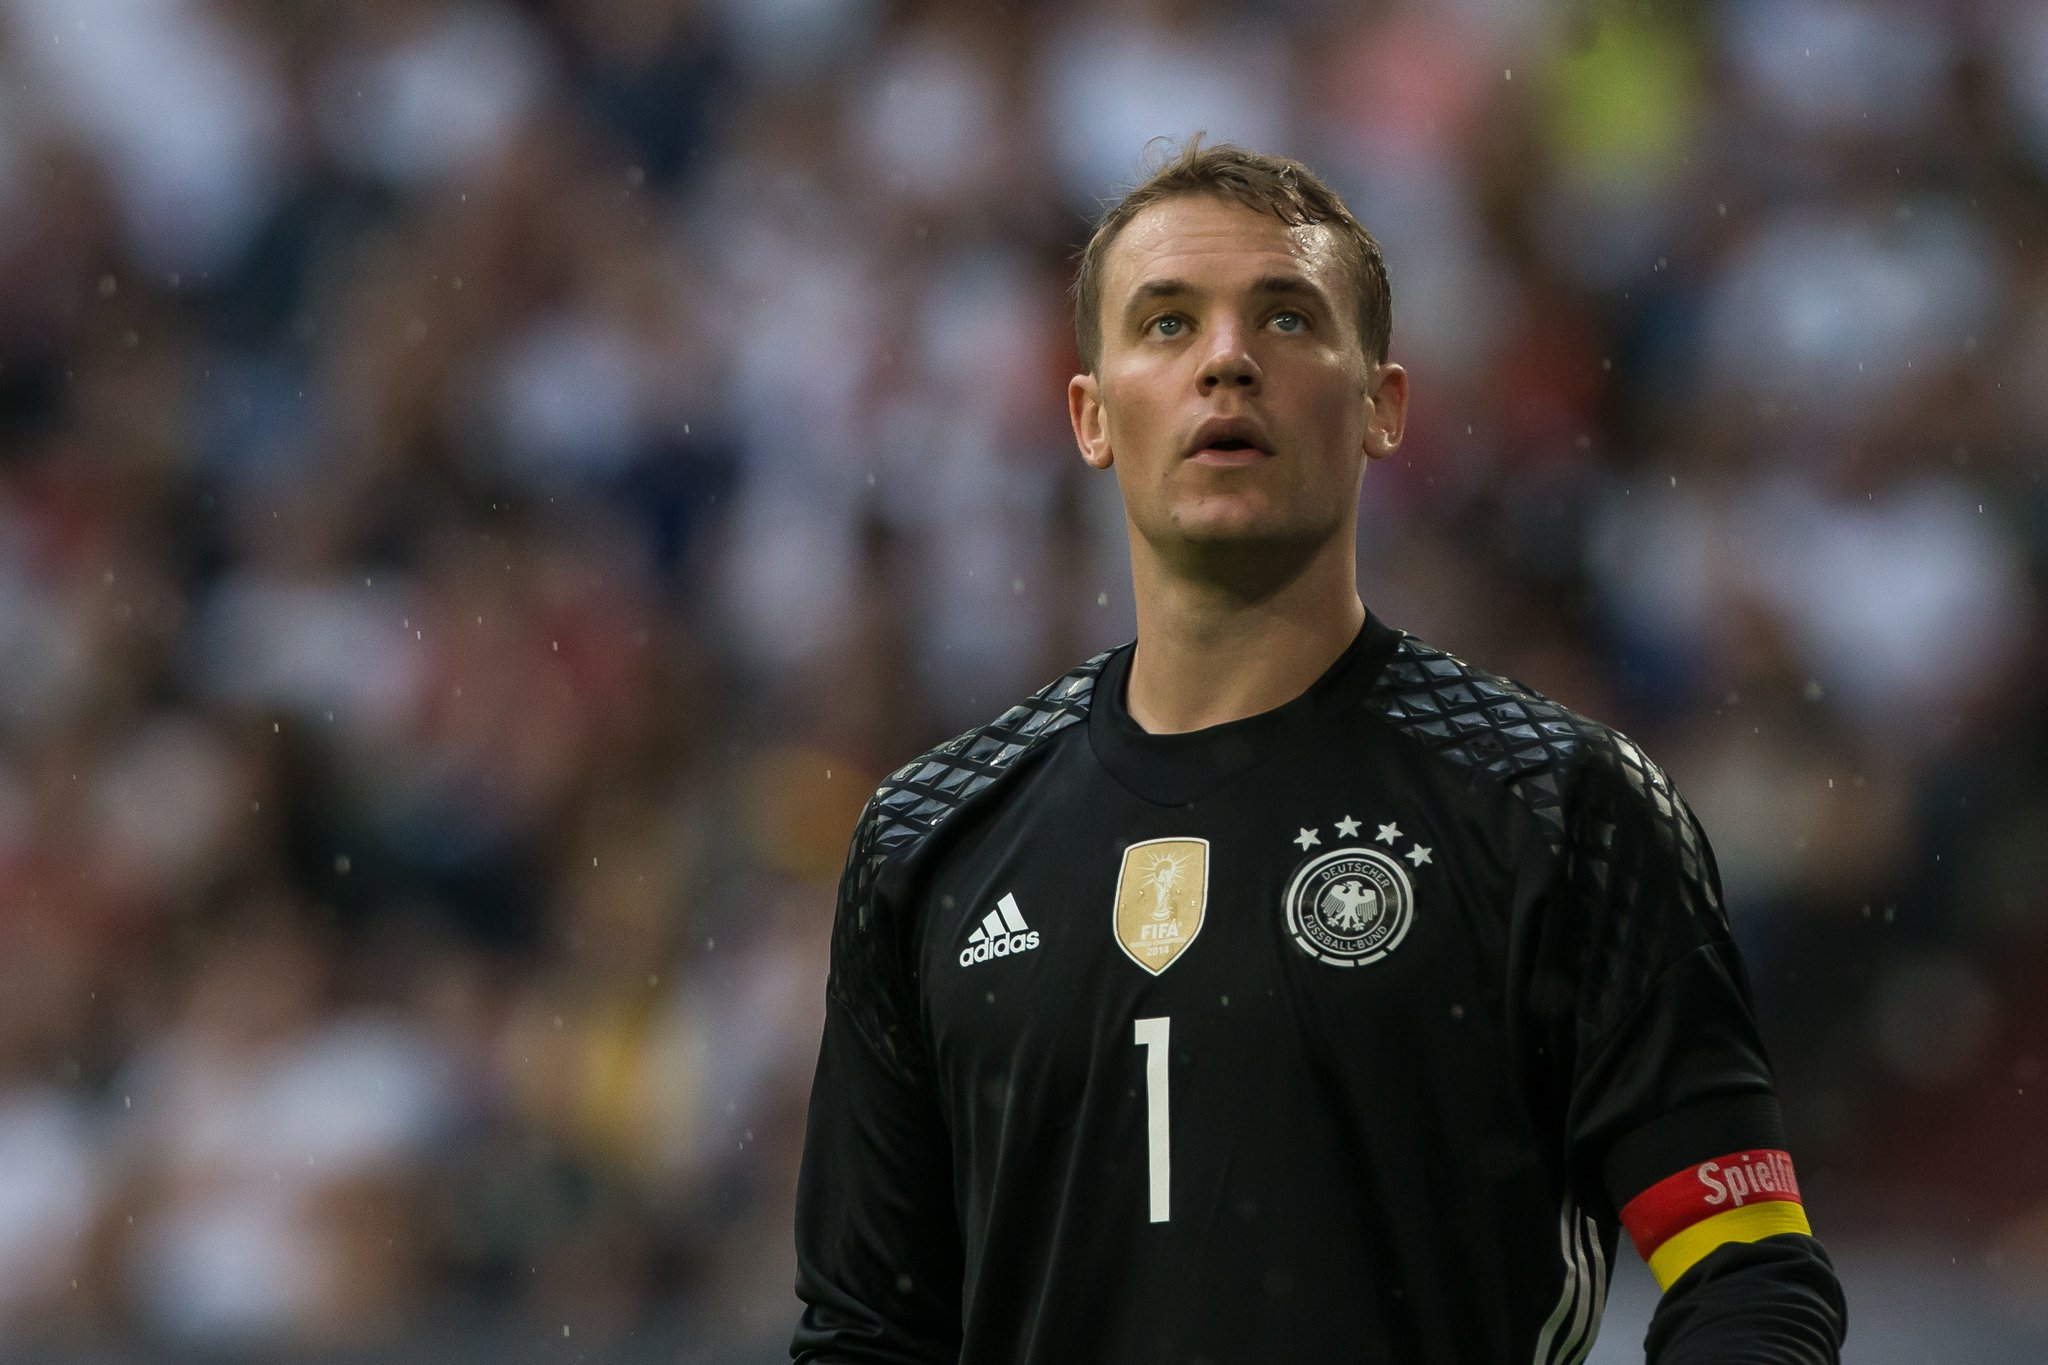 Neuer Succeeds Schweinsteiger As Germany Captain